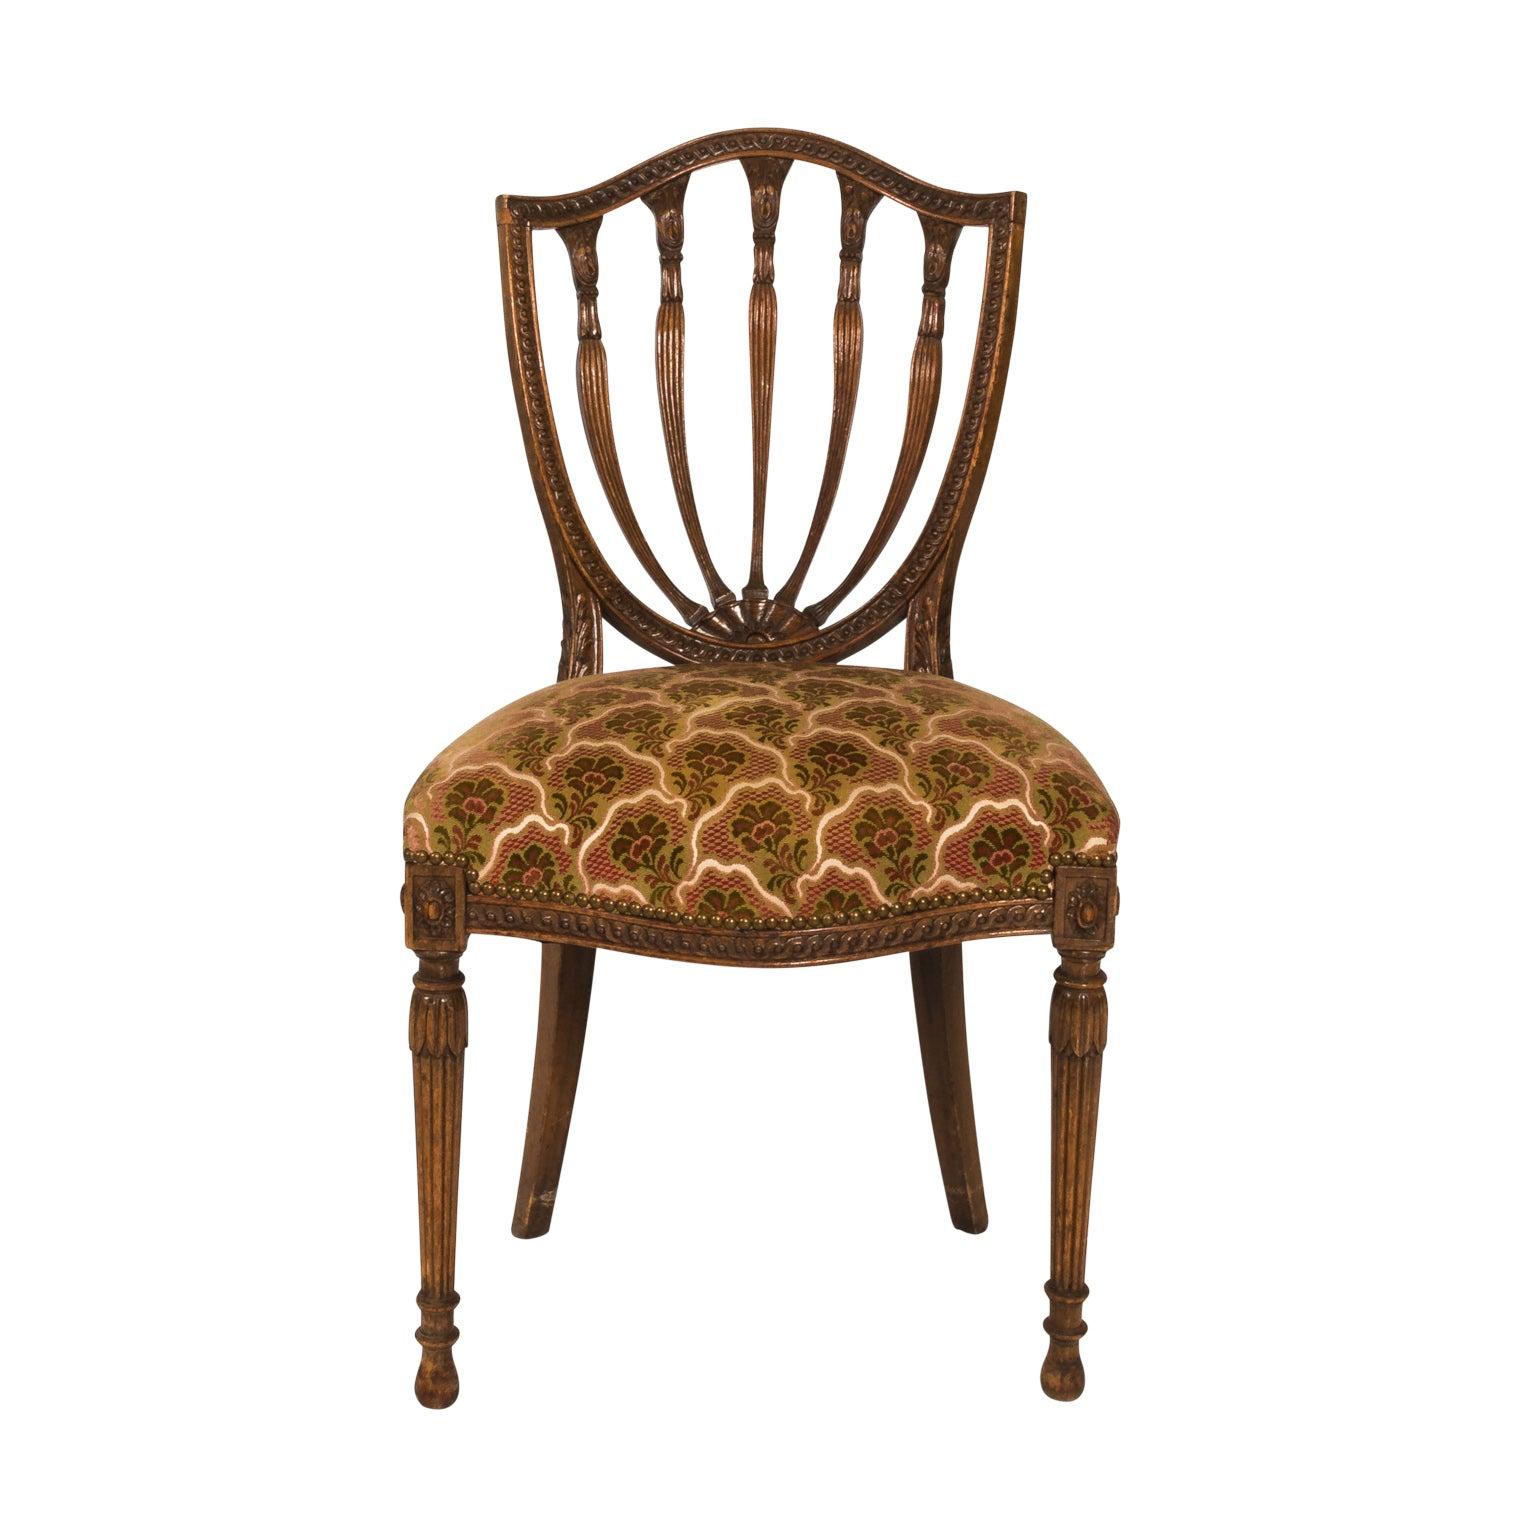 English Hepplewhite Chair, circa 1910